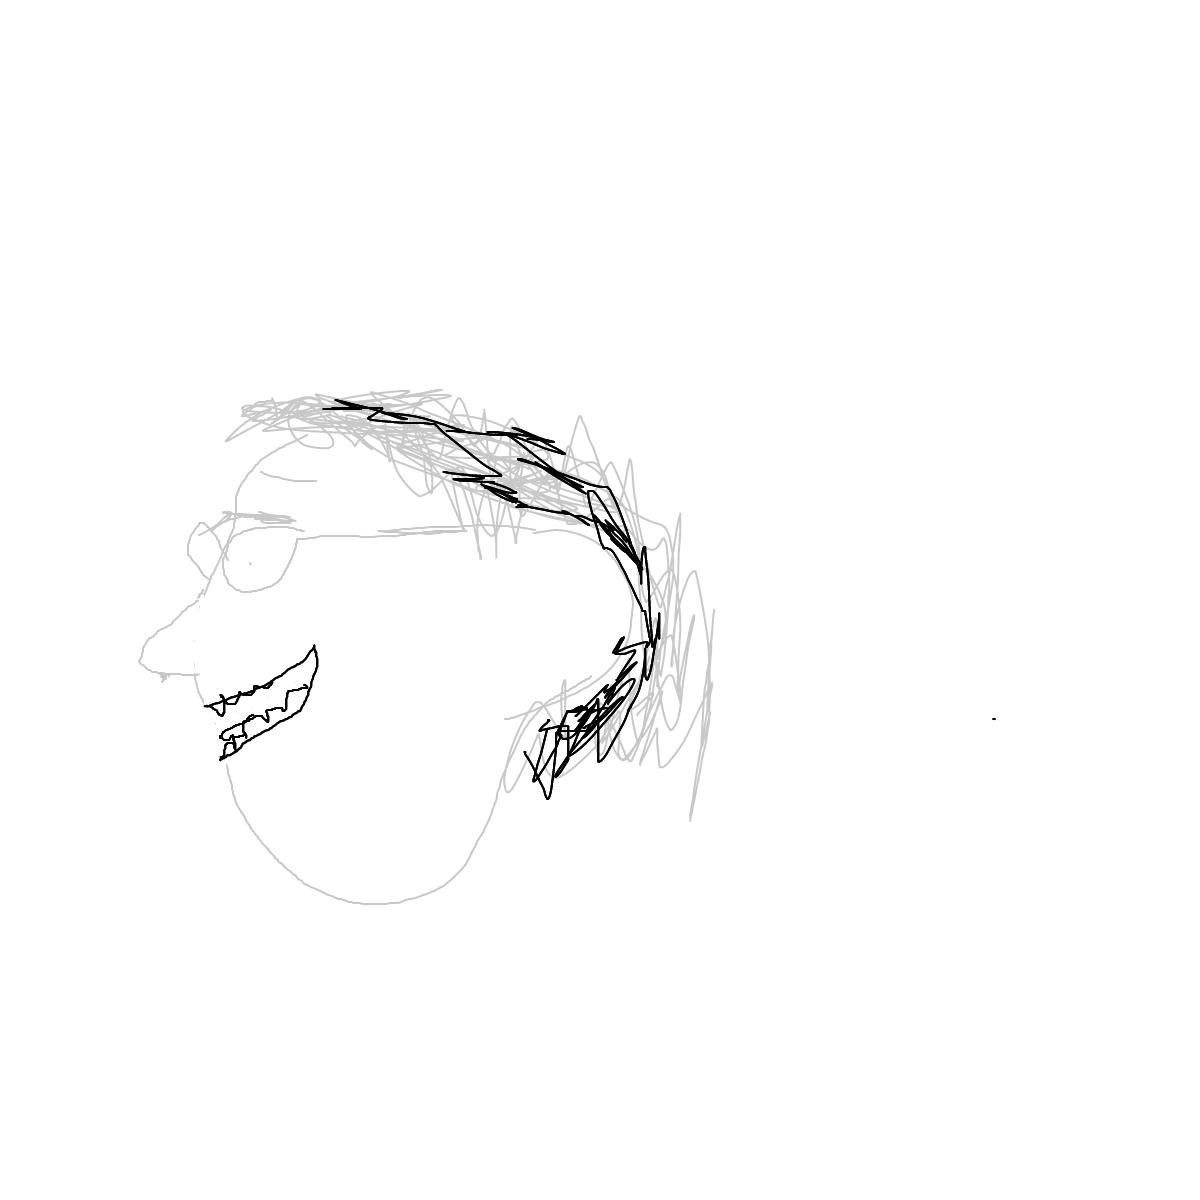 BAAAM drawing#17354 lat:51.2067413330078100lng: 3.2589981555938720